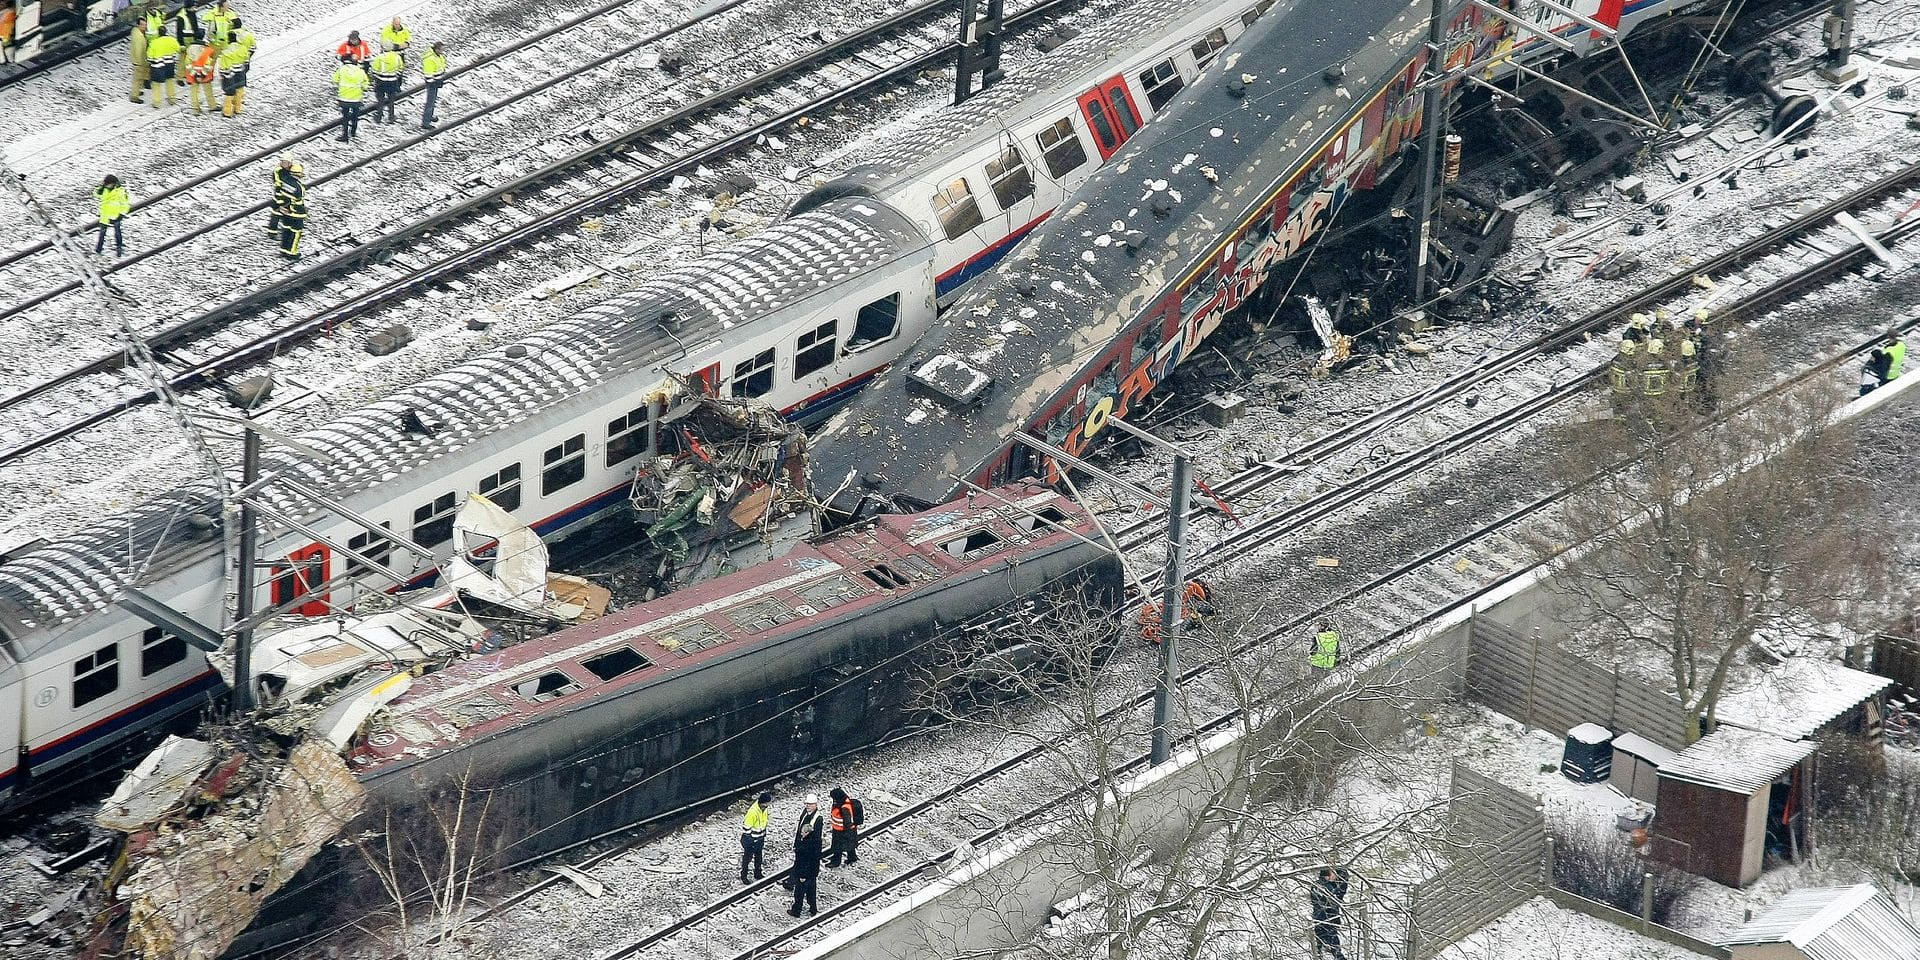 BELGIUM HALLE TRAINS ACCIDENT DISASTER AERIAL VIEW